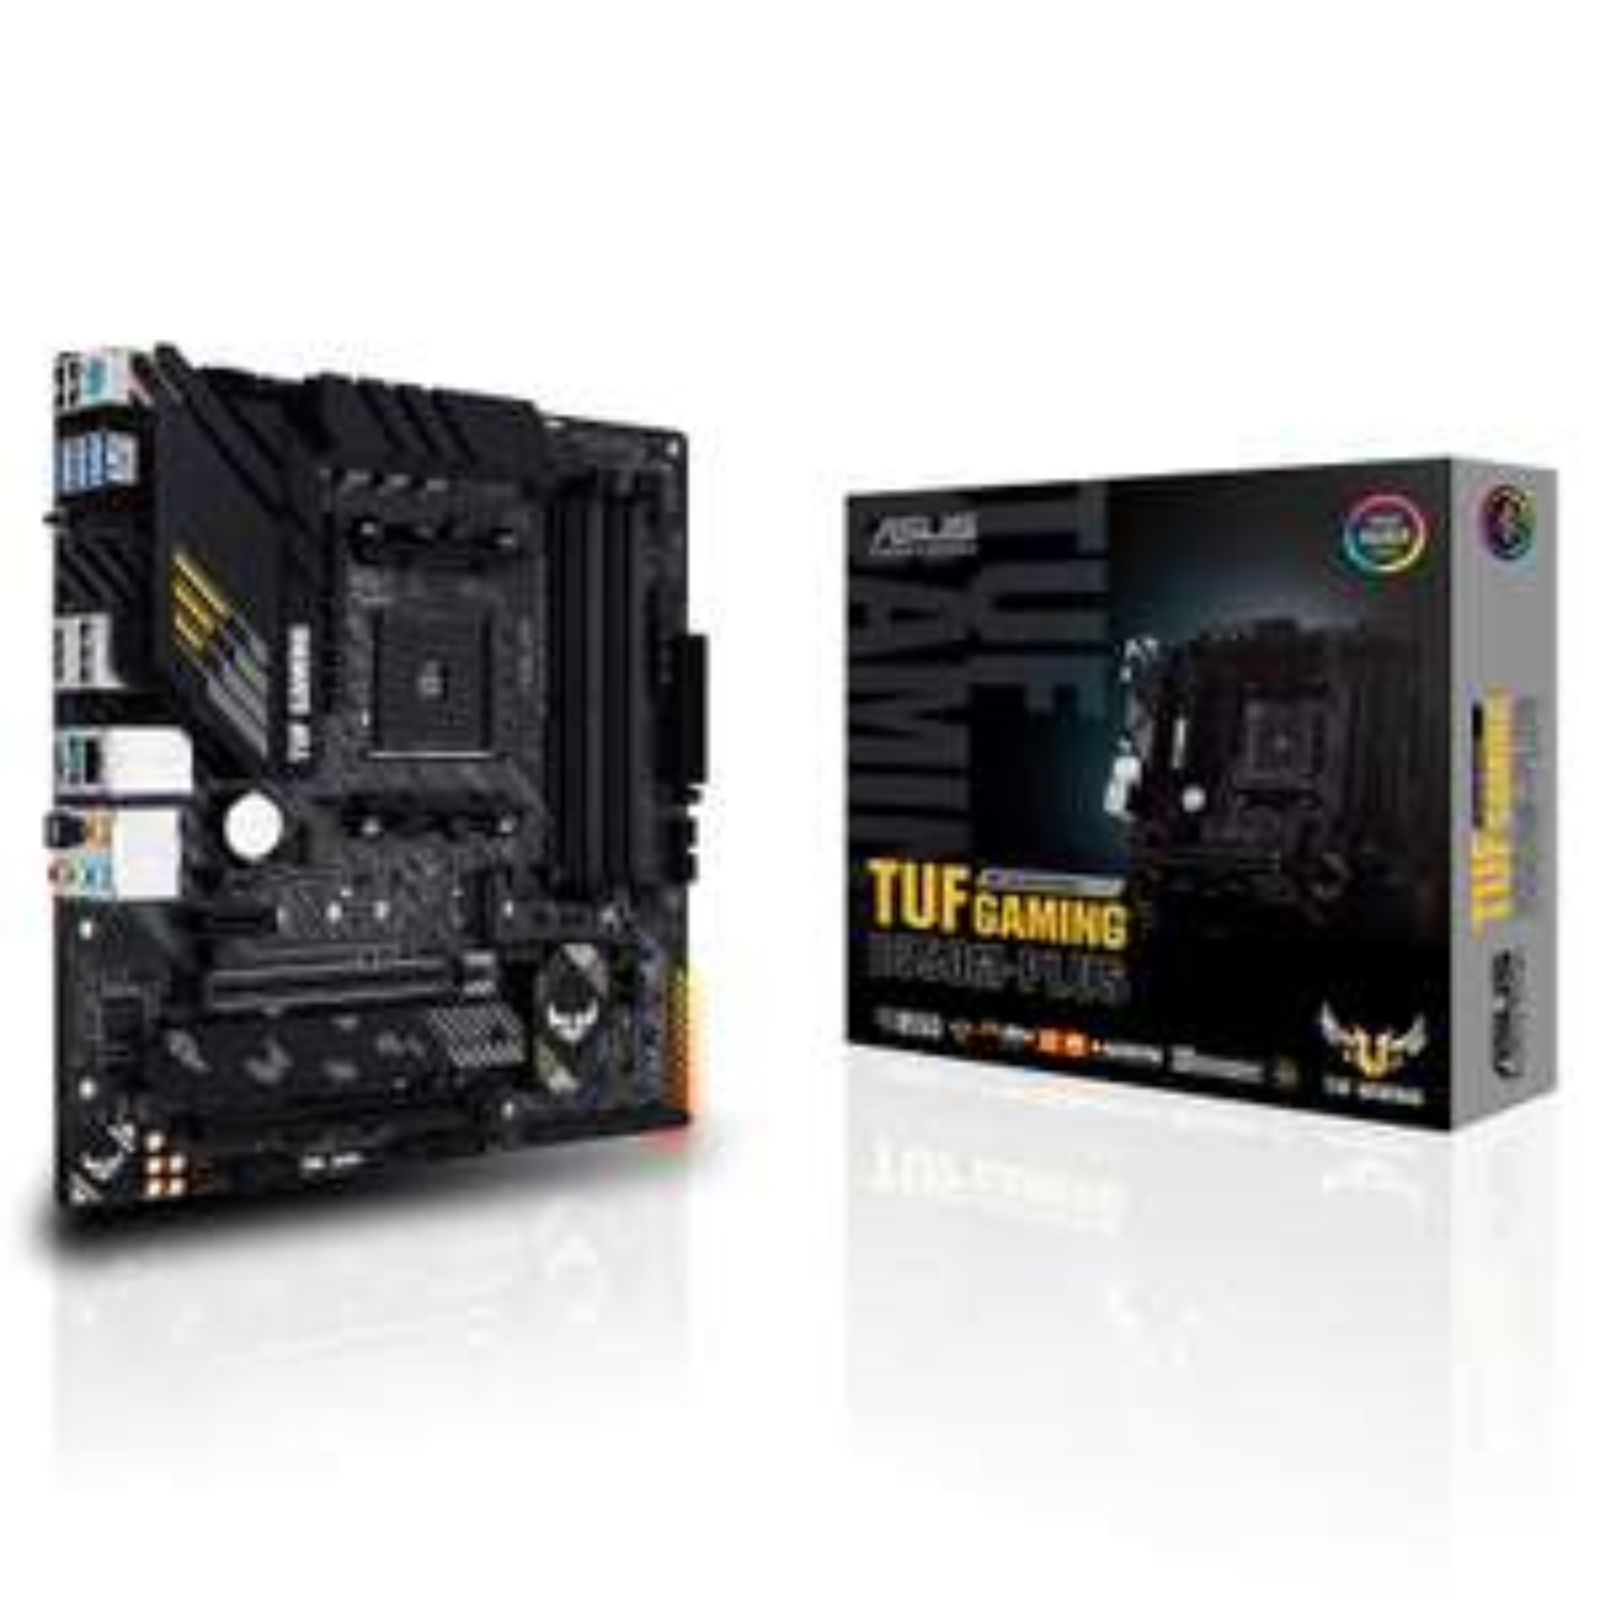 Carte mère Asus TUF Gaming B550M Plus - mATX